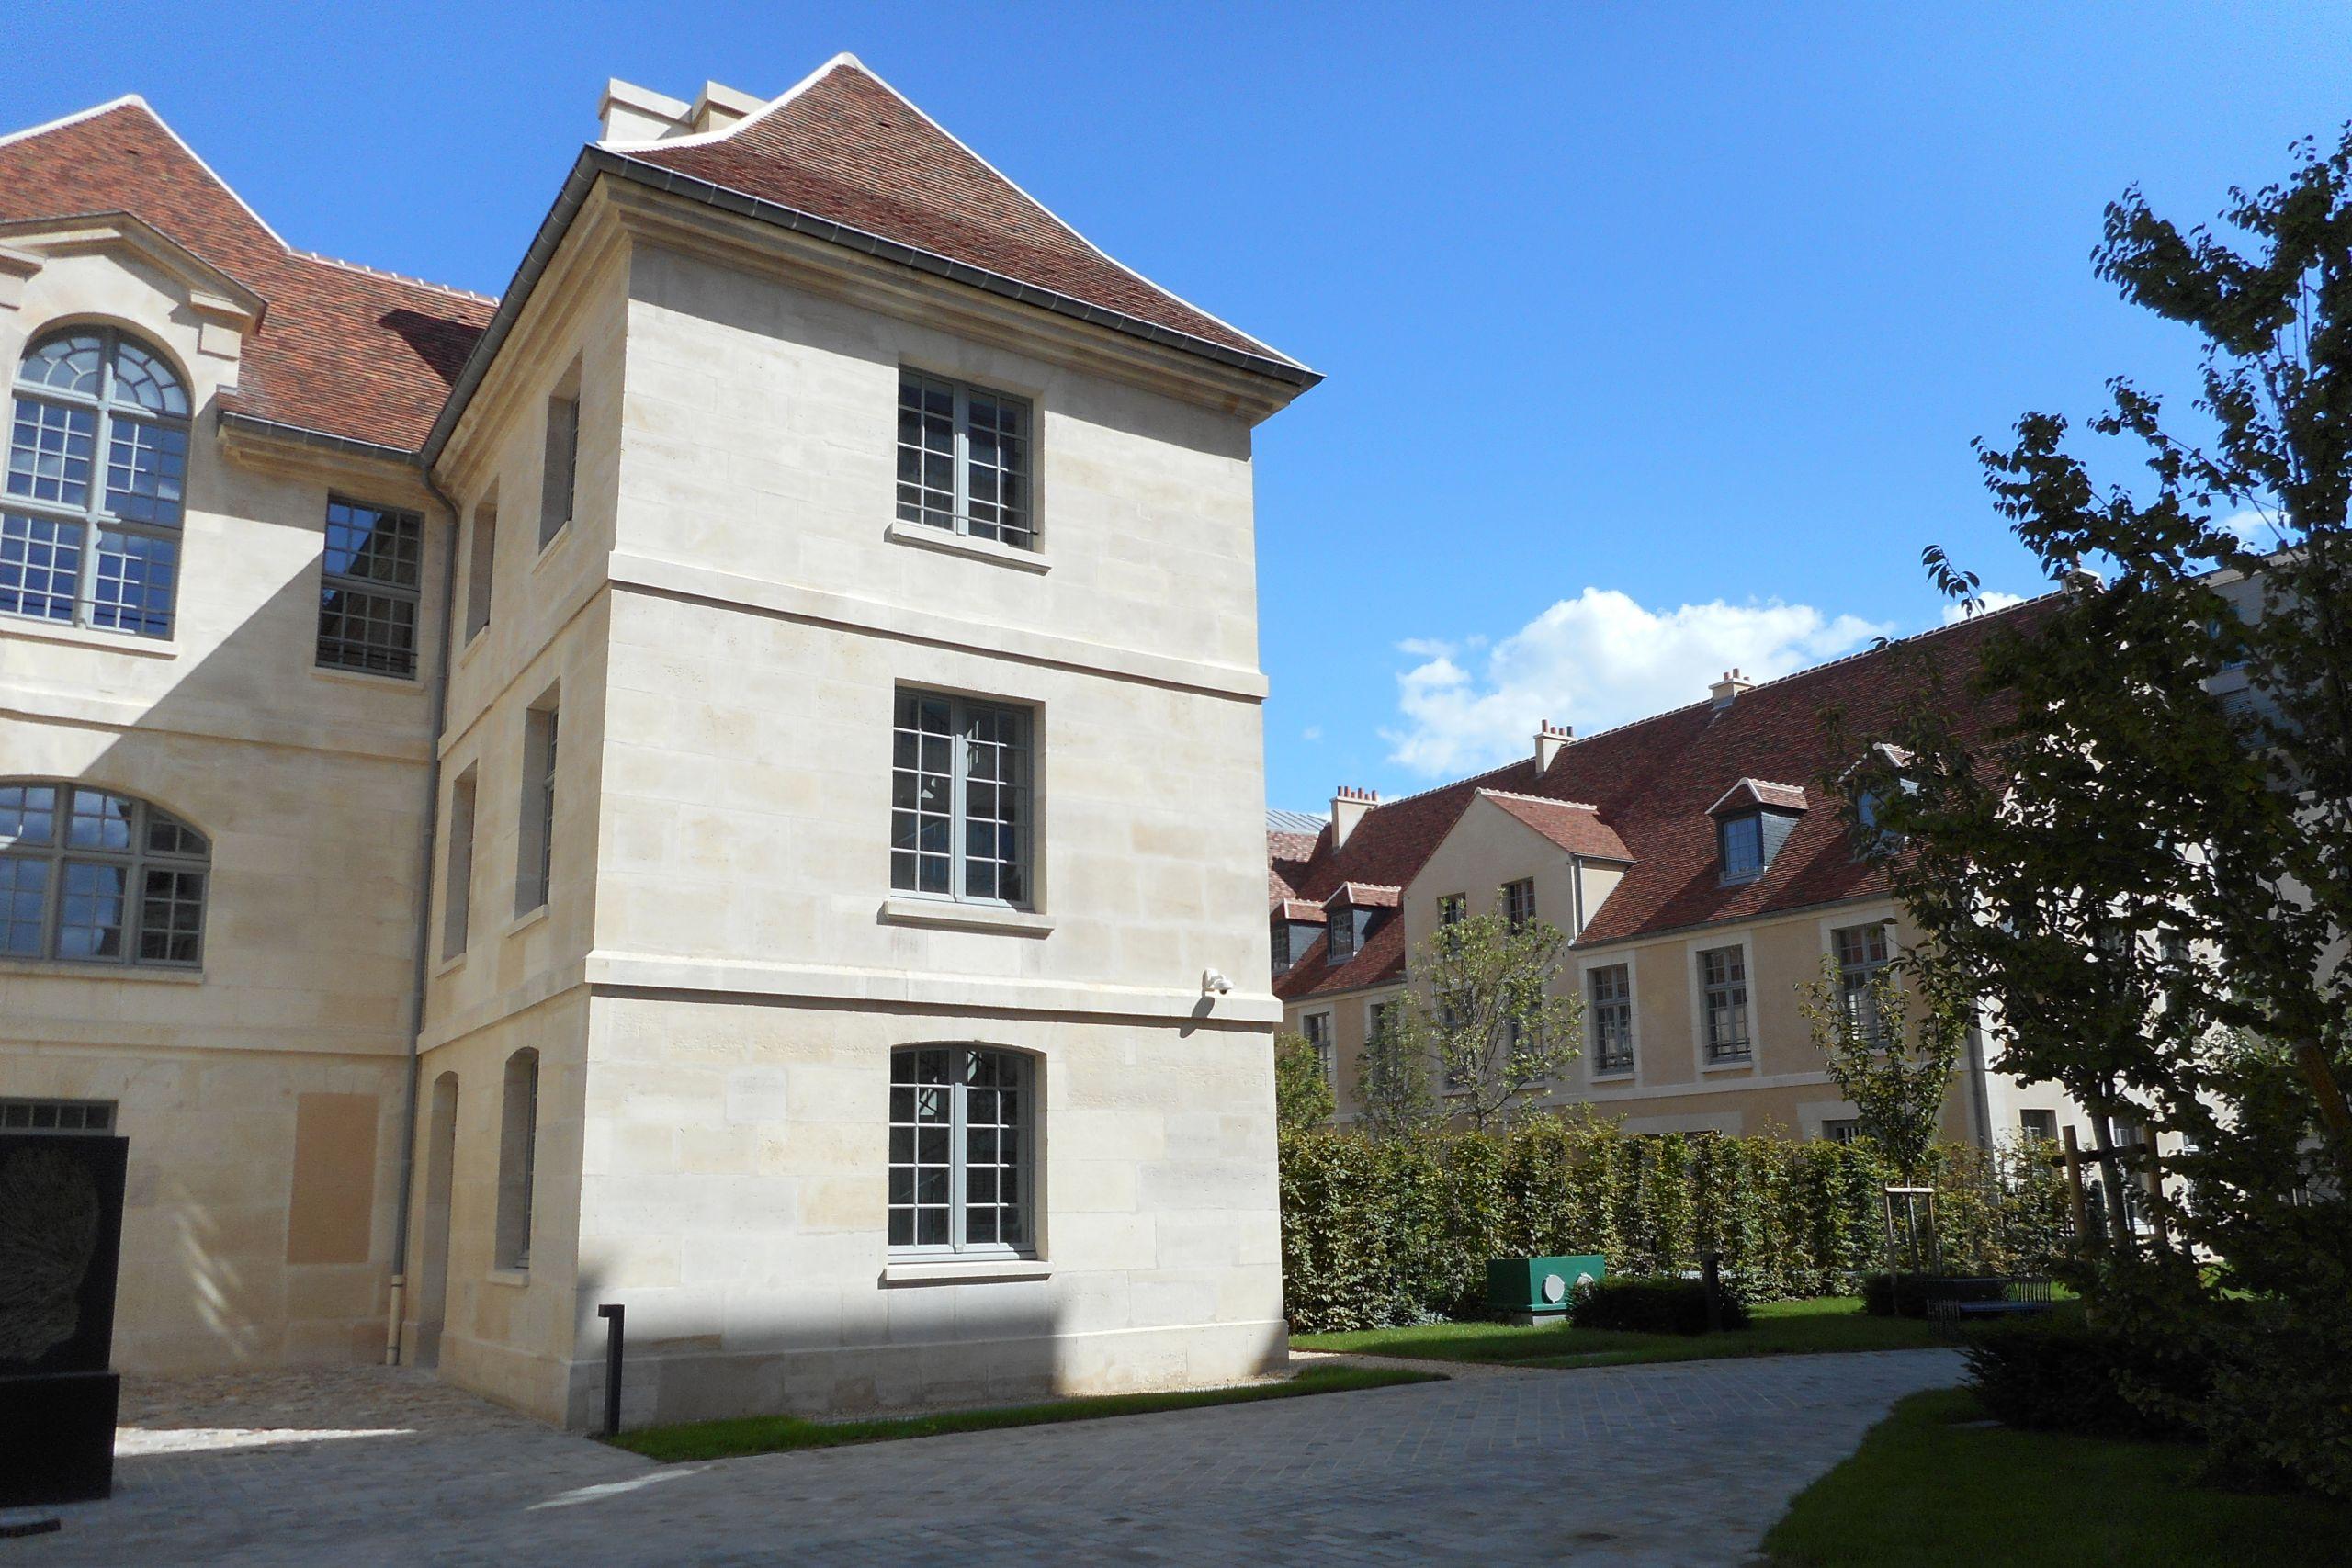 Studio Résidence Laennec